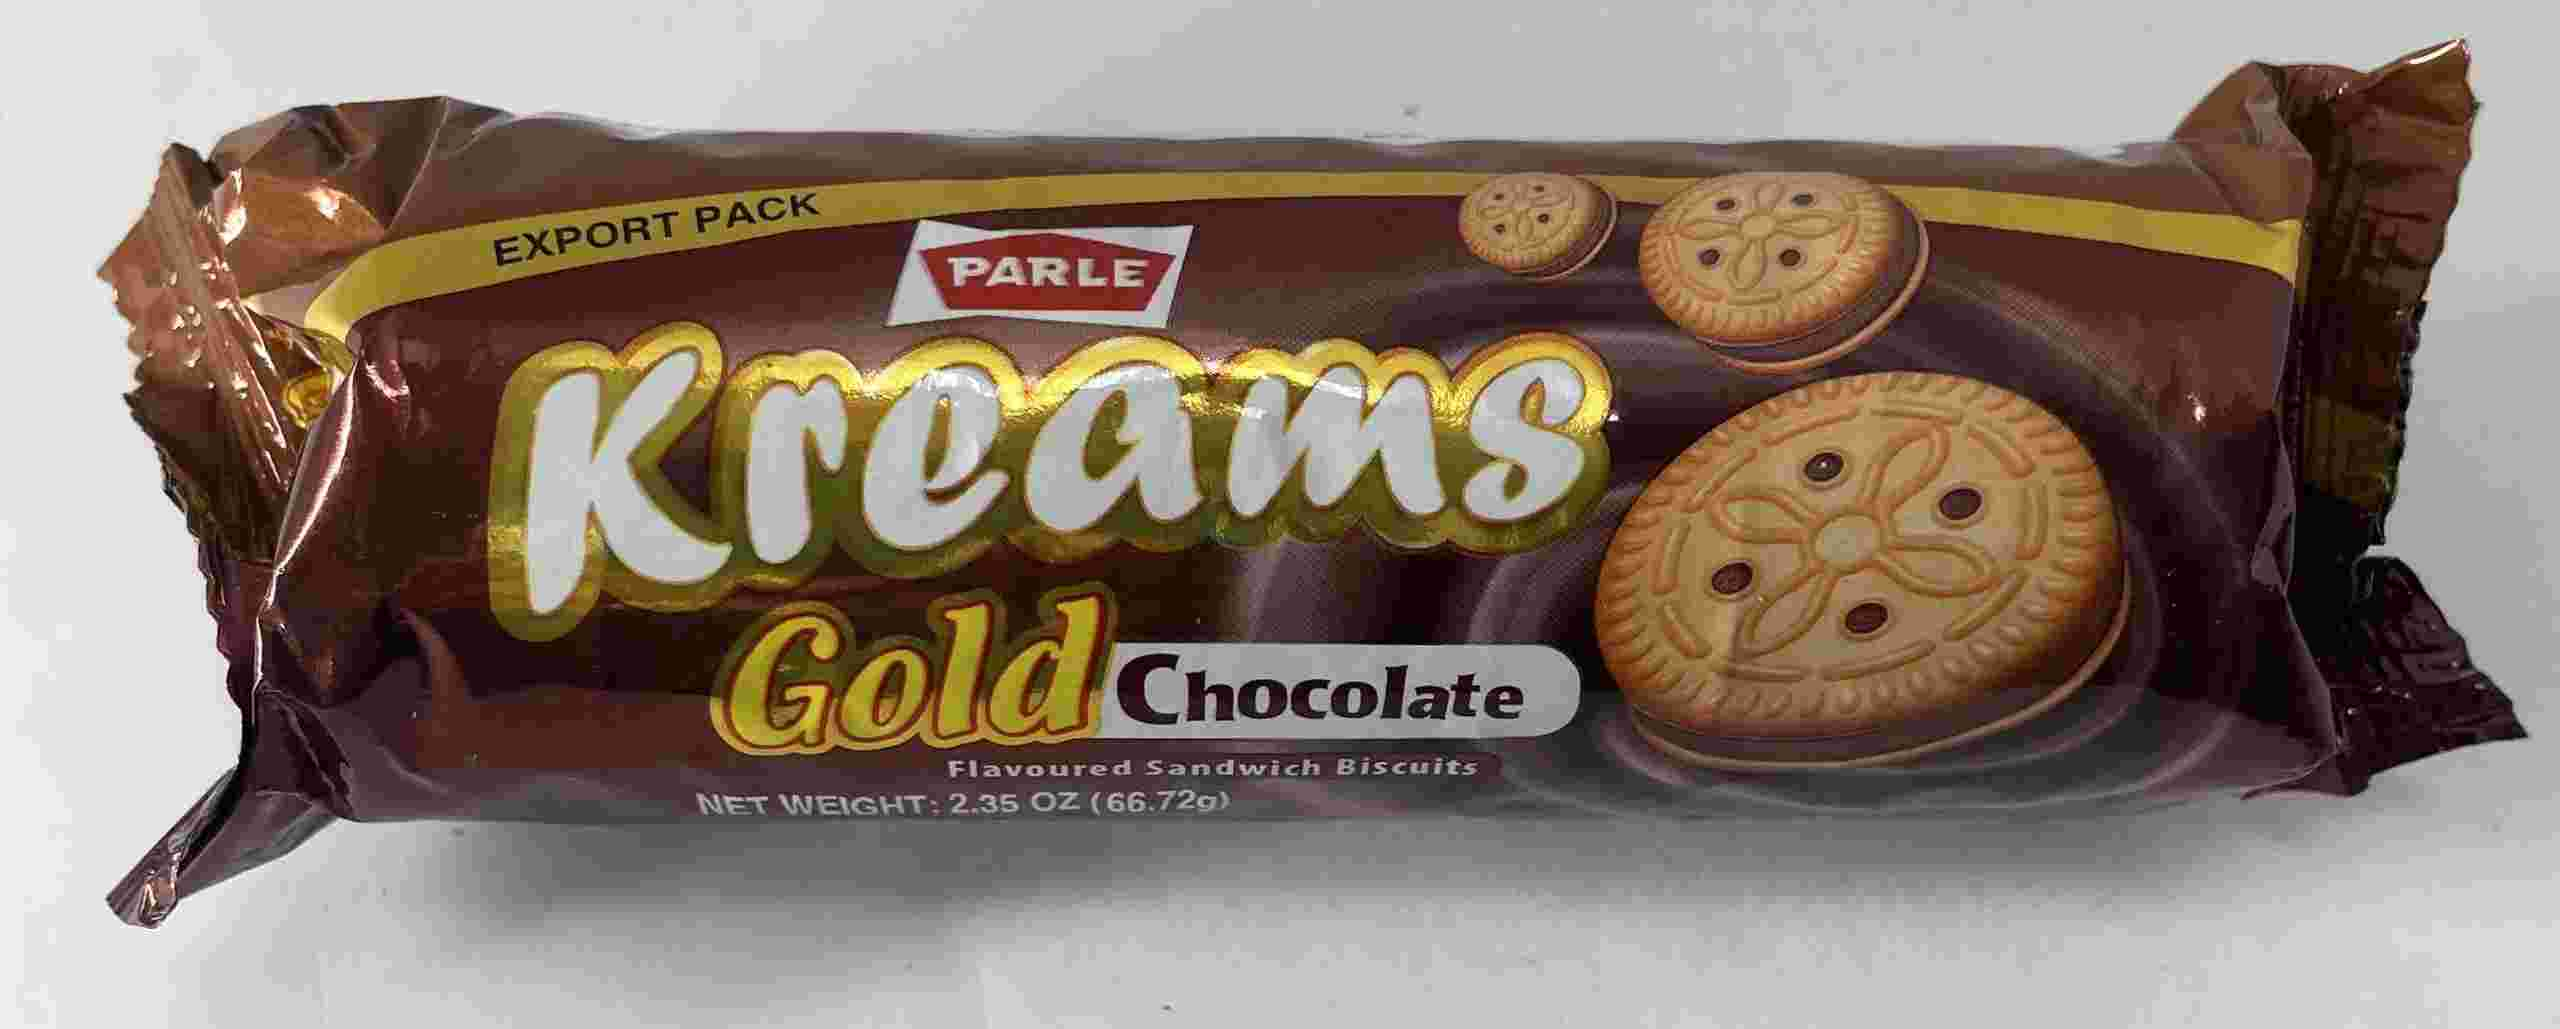 Parle Kreams Gold Chocalate